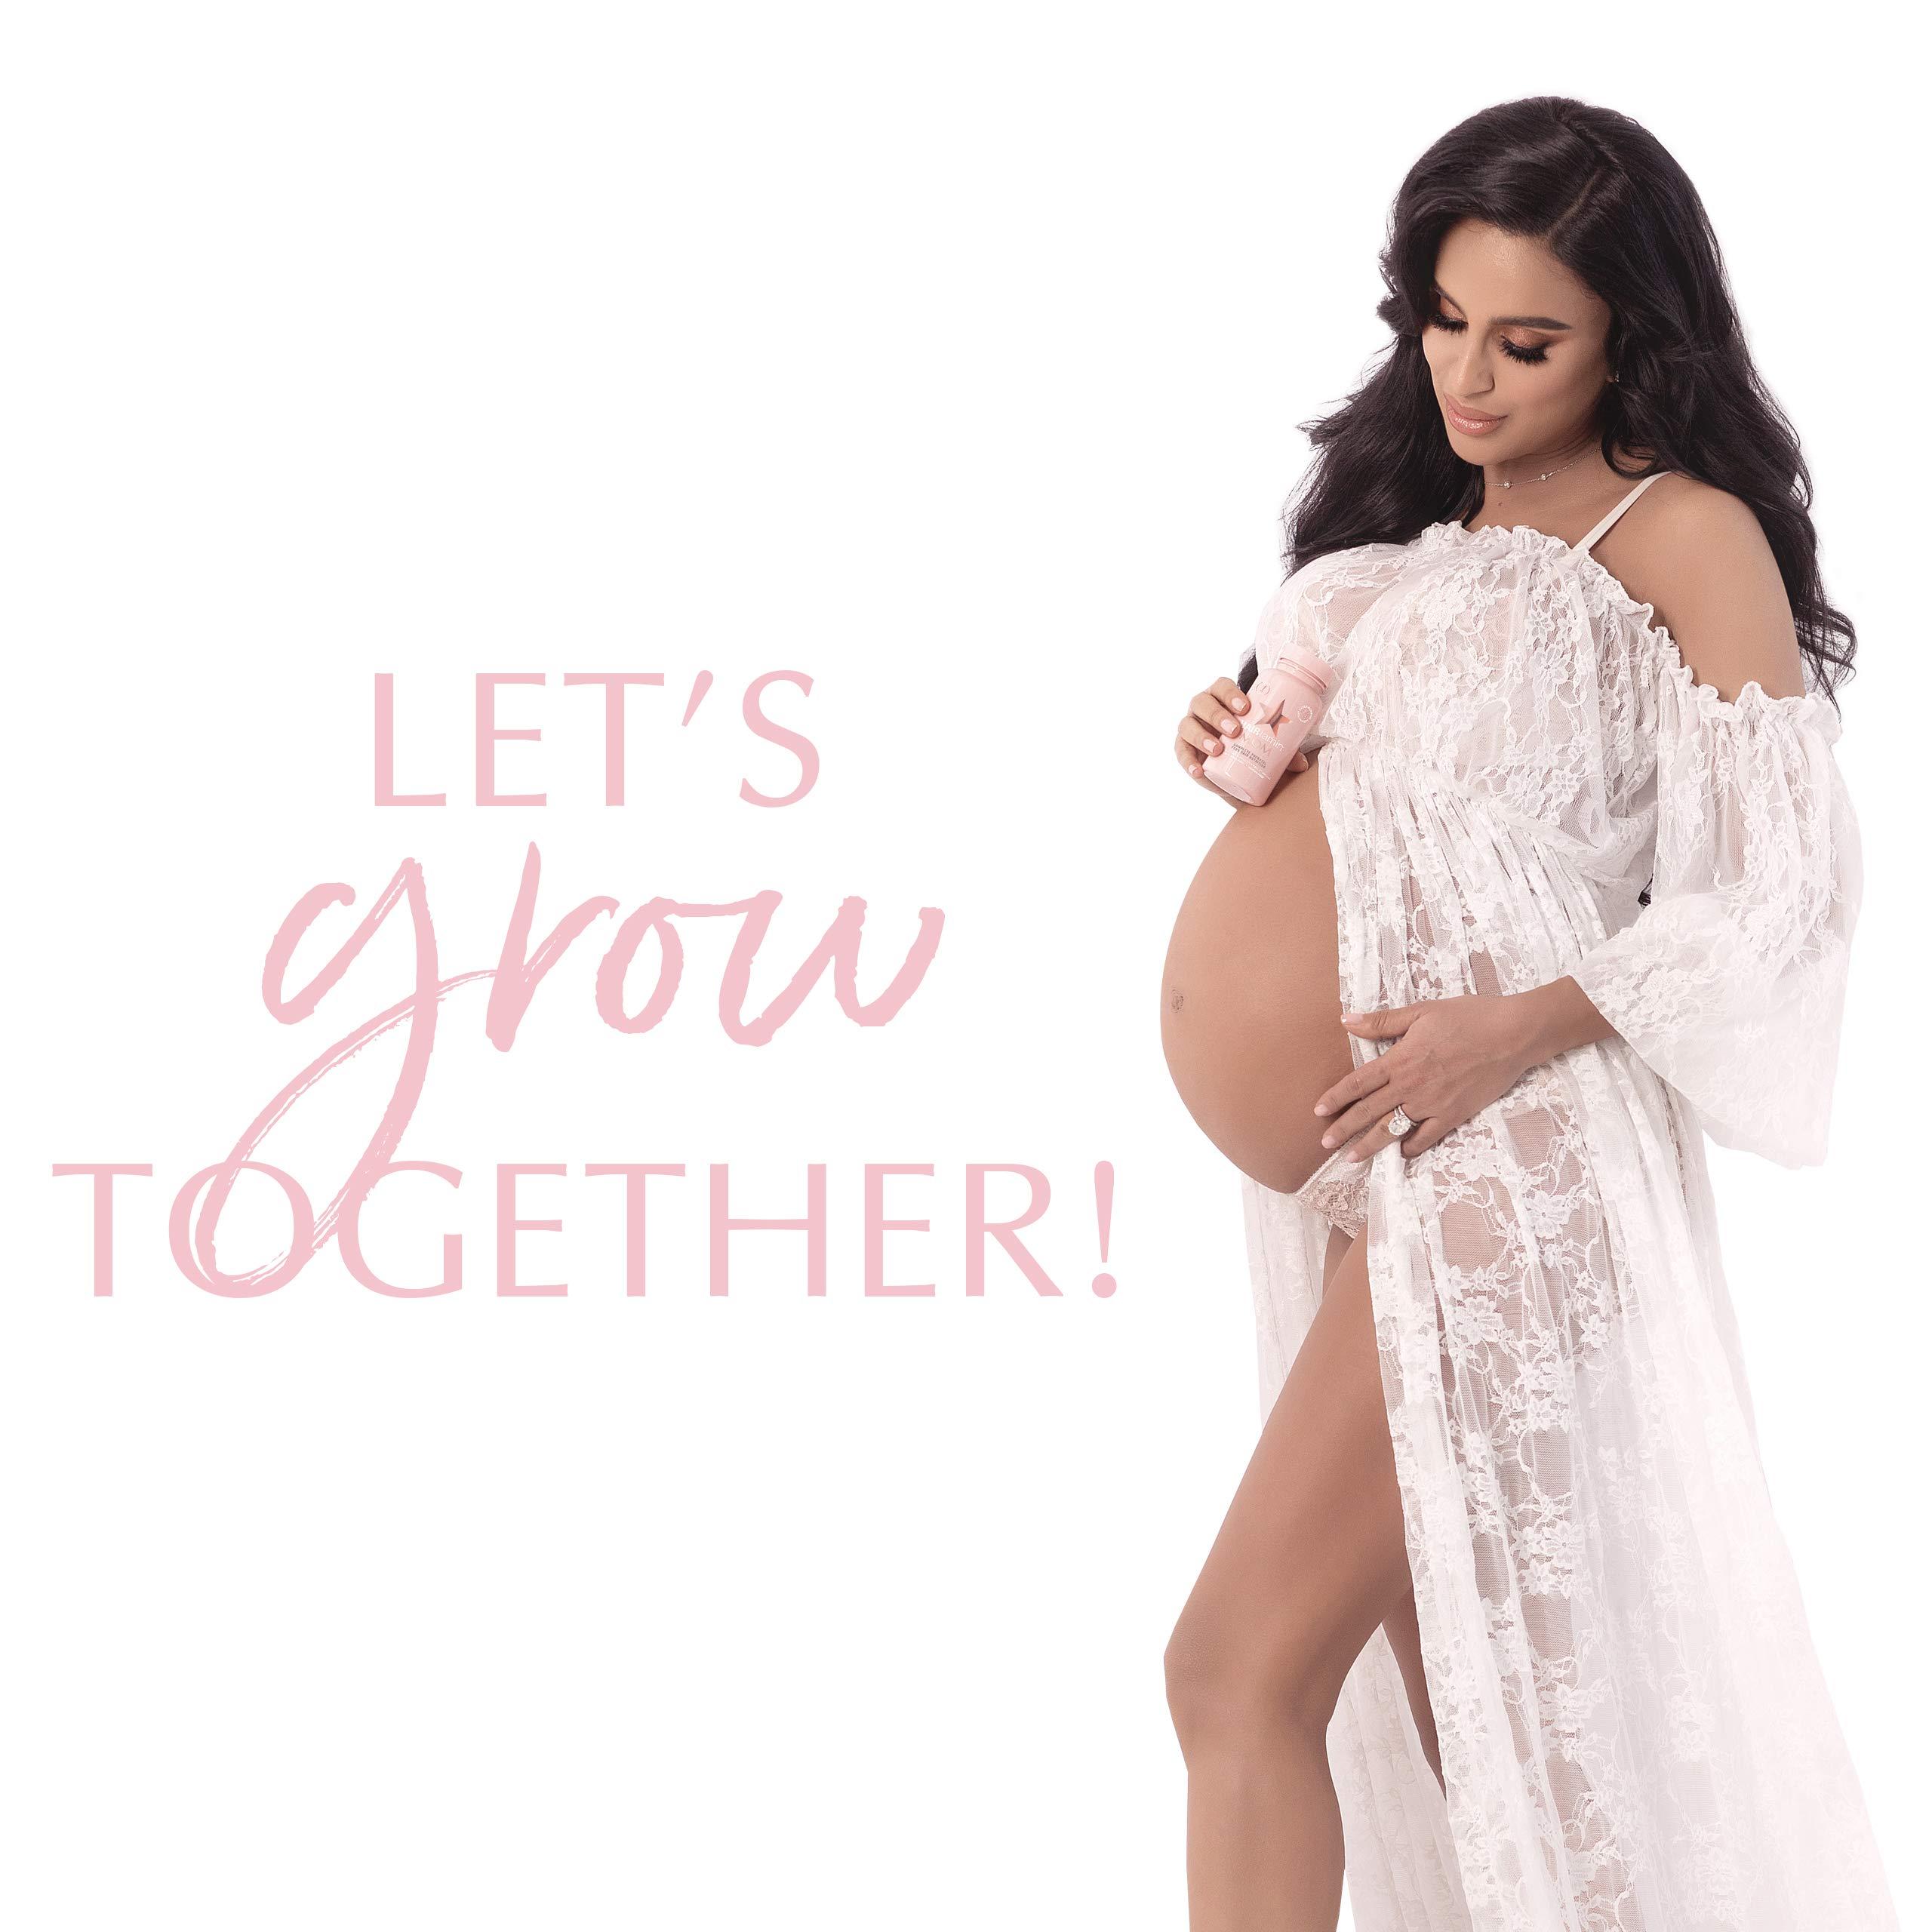 HAIRtamin MOM Vegan Prenatal Vitamins for Women, Natural Multivitamin for Expecting Mothers with Biotin, Probiotics, Vitamin B-6, Iron, Best Post-Natal Vitamin to Promote Healthy Hair & Nails - $29.99 by HAIRtamin (Image #8)